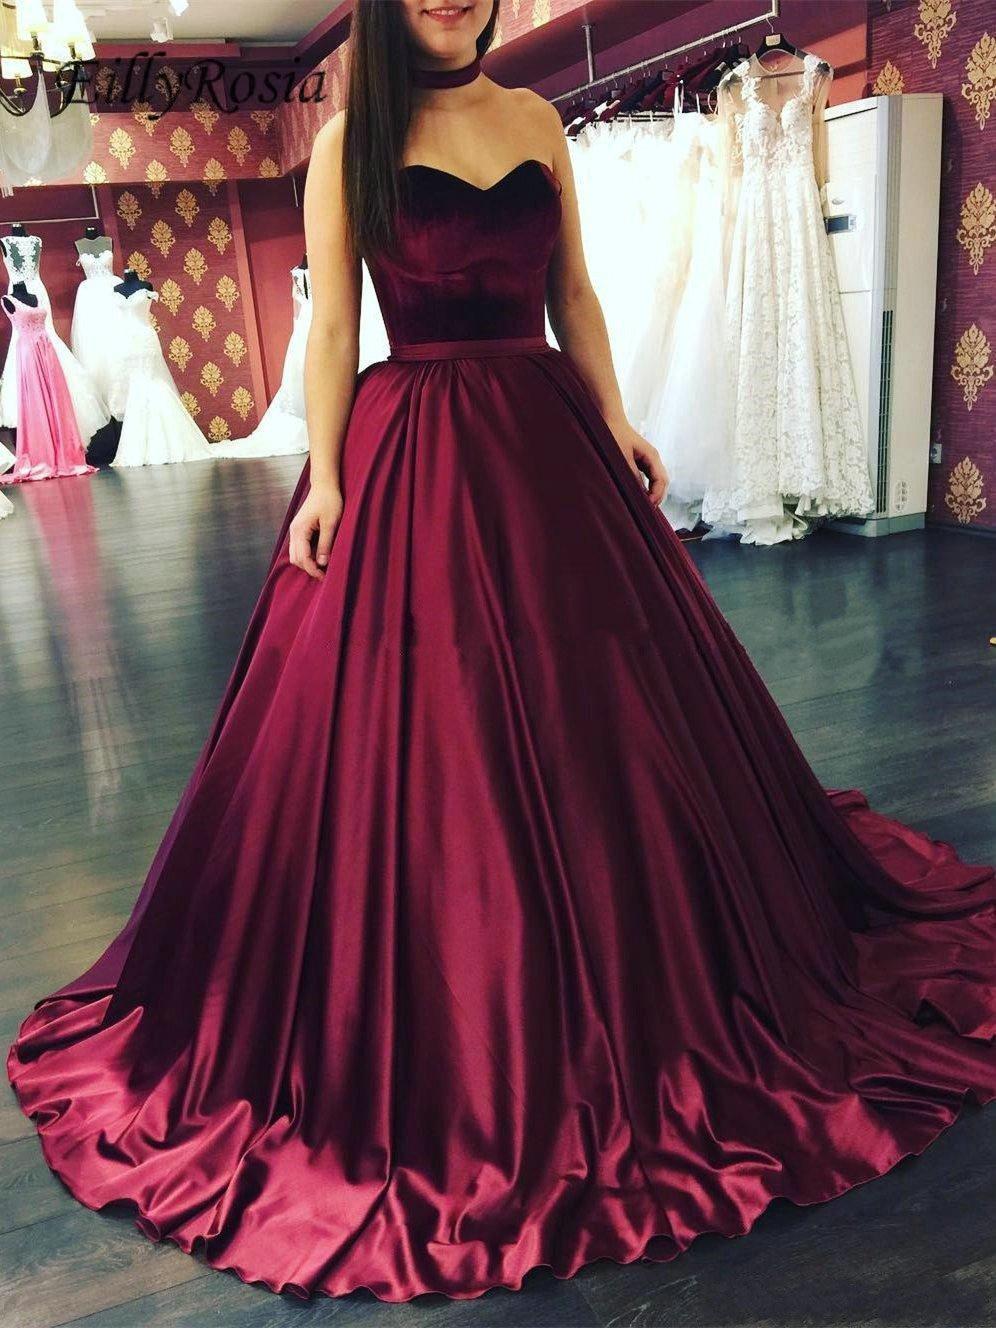 Big Offer Dark Red Satin Burgundy Prom Dresses Ball Gown Sweetheart Sweep  Train Elegant Grils Graduation Gala Dress ballkleider lang 20 October 20